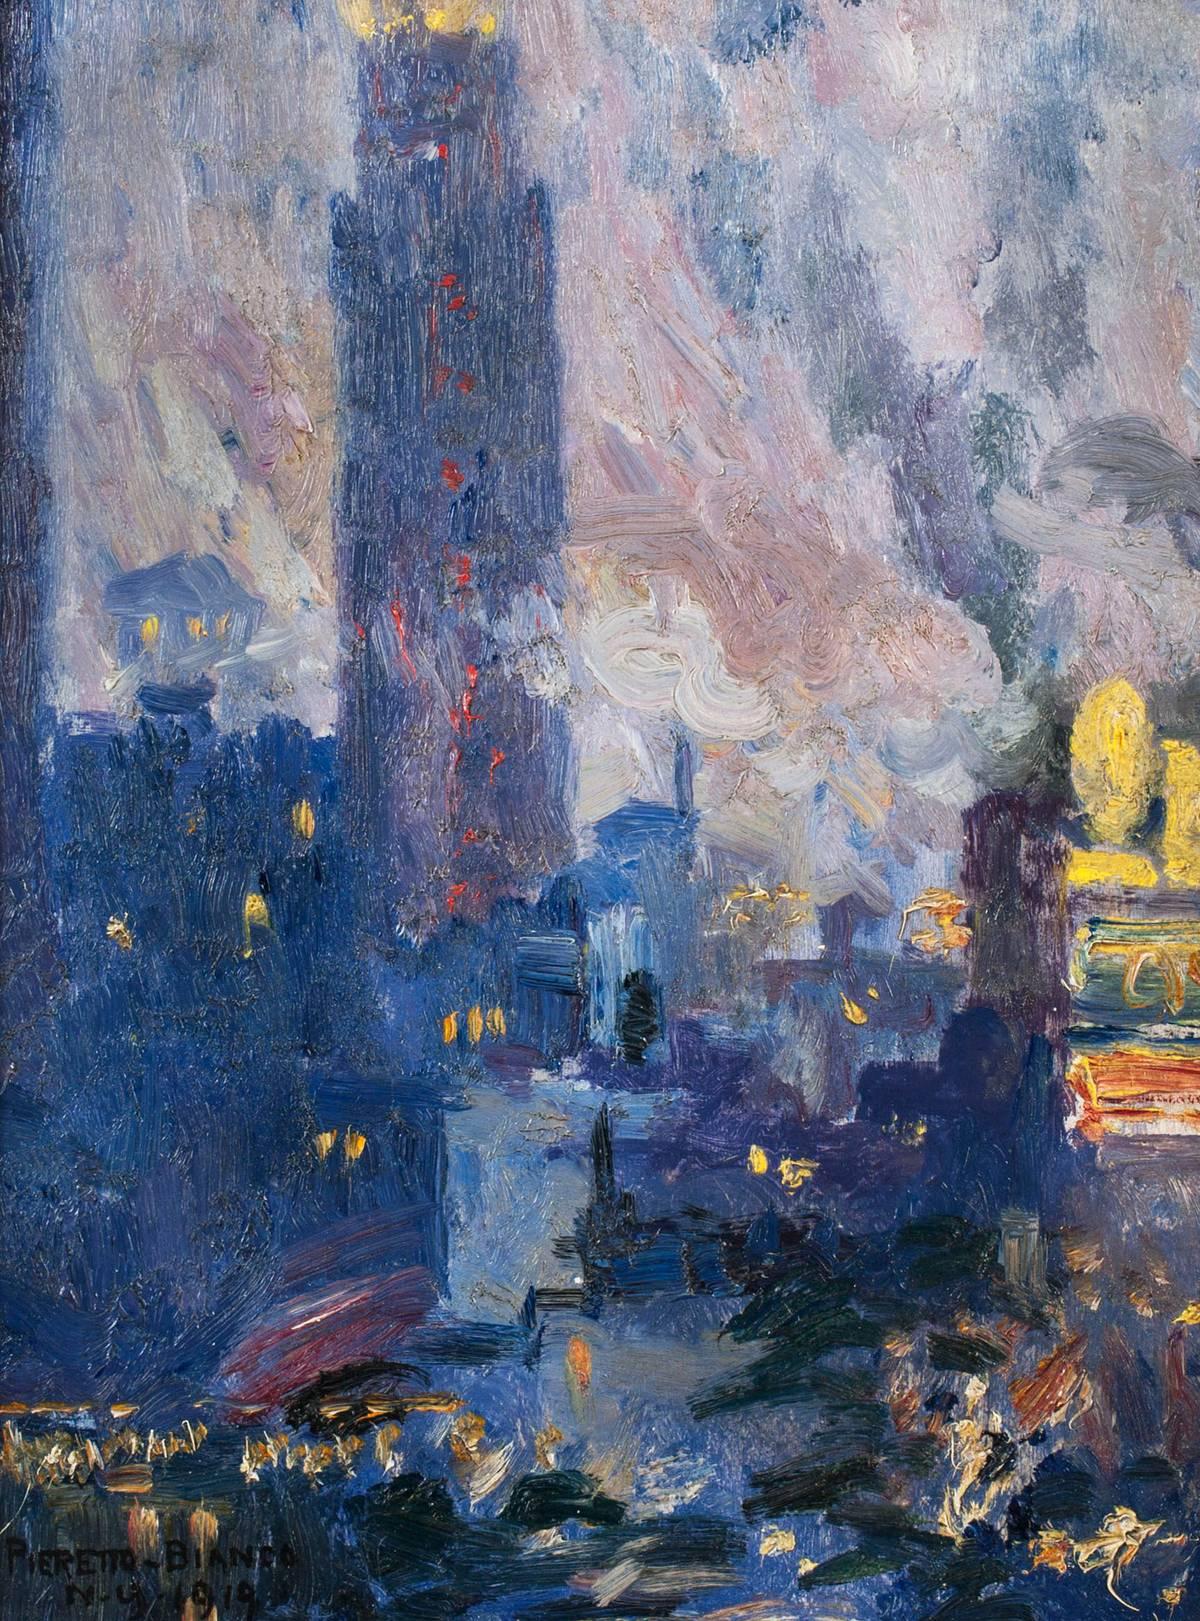 Pieretto Bianco Bortoluzzi (1875 - 1937) Notturno Bush Terminal {Bush Terminal Park at Night} Unframed